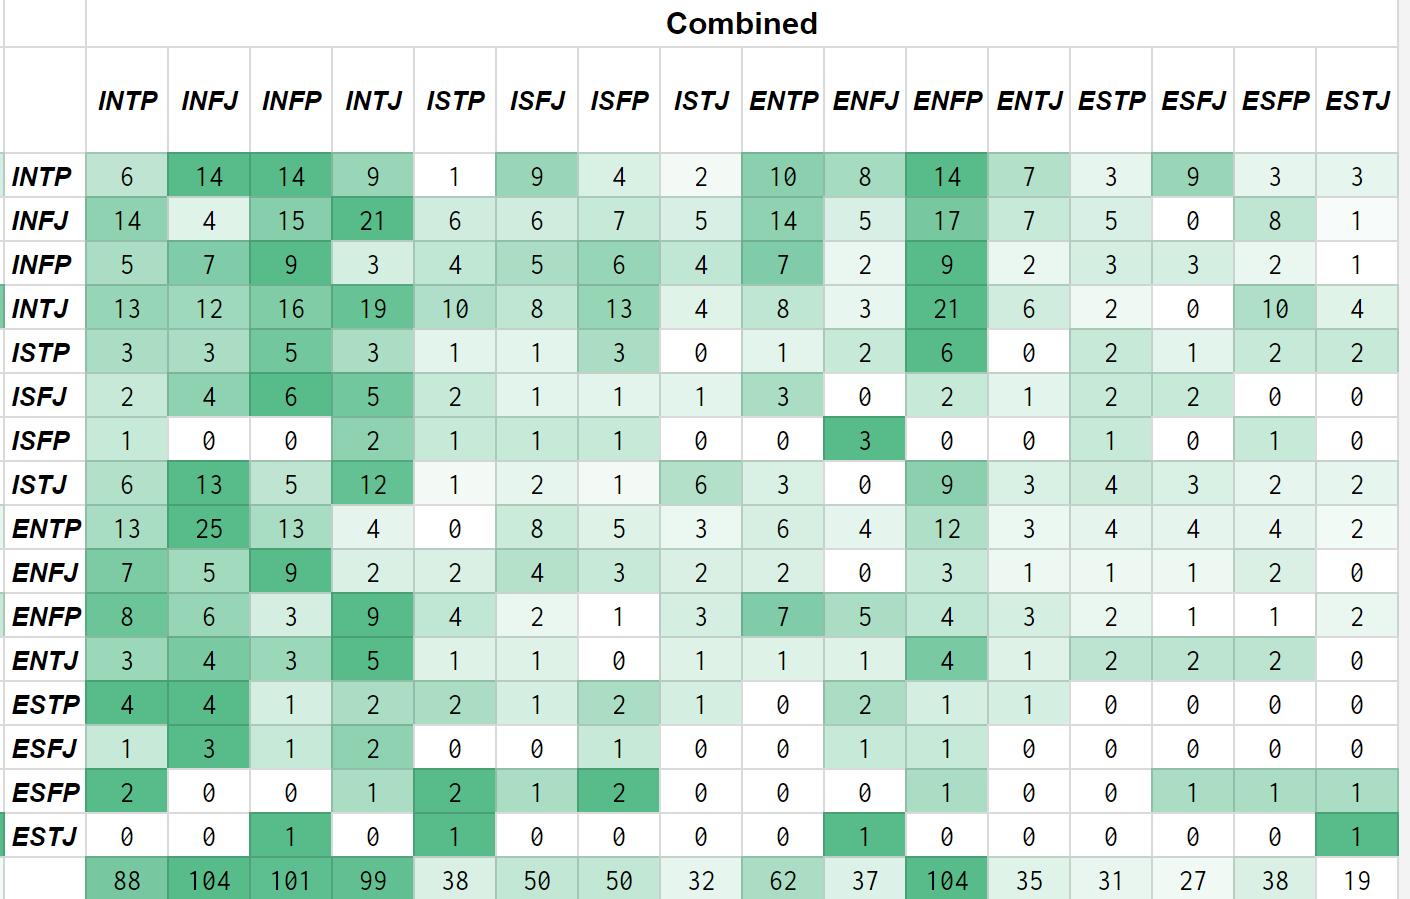 Chart Compatibility Mbti Https Docs Google Com Spreadsheets D 1yfpubw92vh Bgrvf Fmngycdteryvvvgoel T58kw9 Mbti Compatibility Chart Mbti Mbti Compatibility